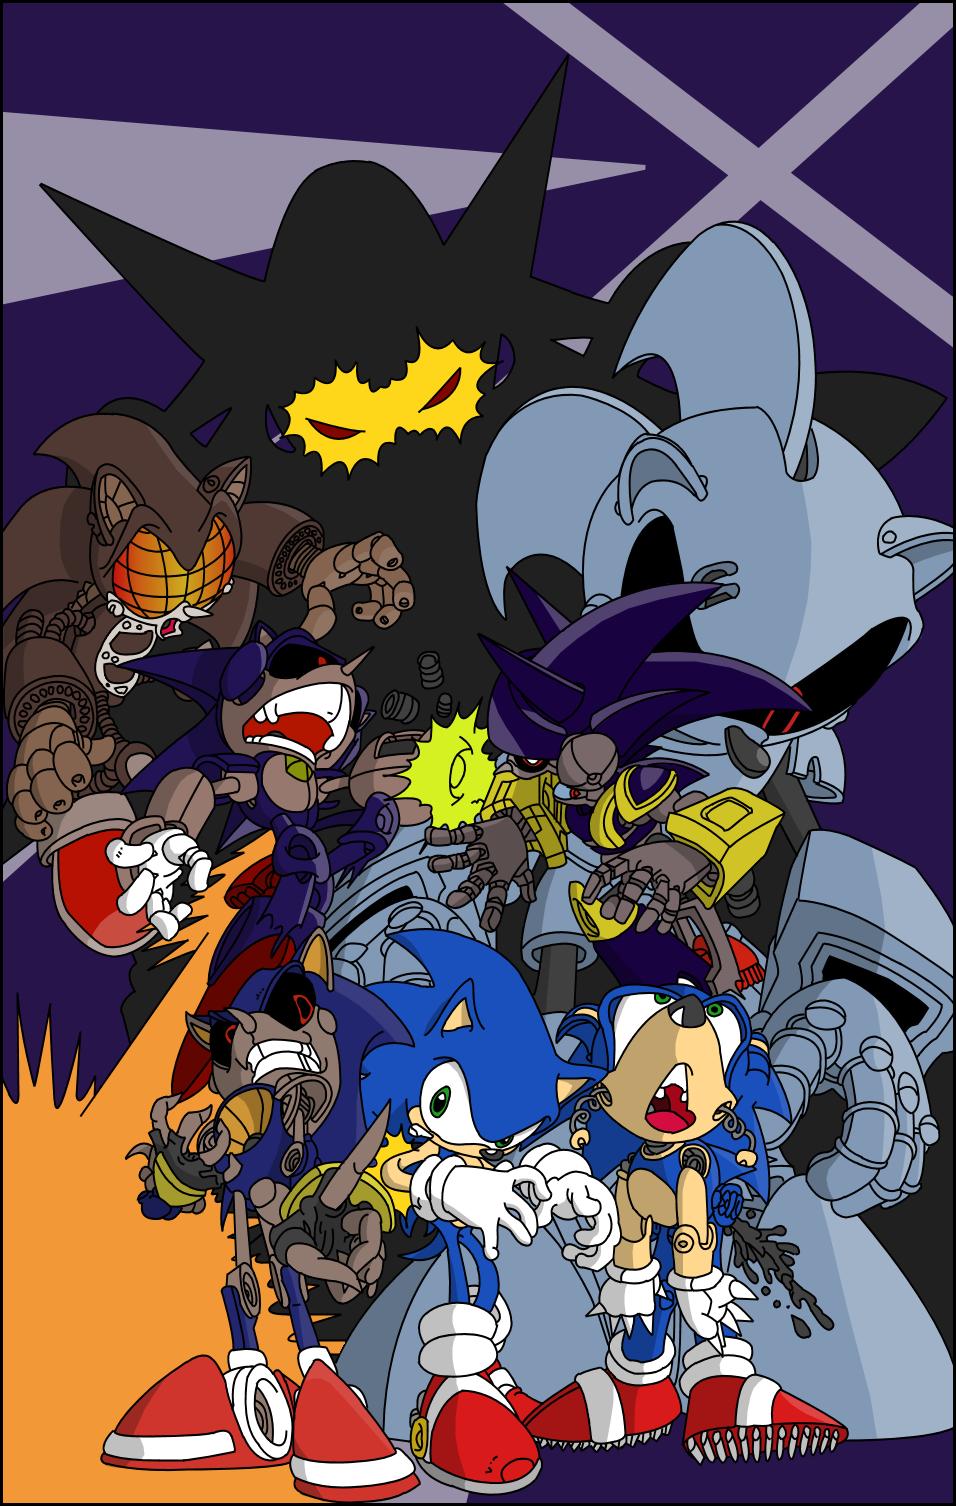 sonic metal madness by ssjcybersonic on deviantart